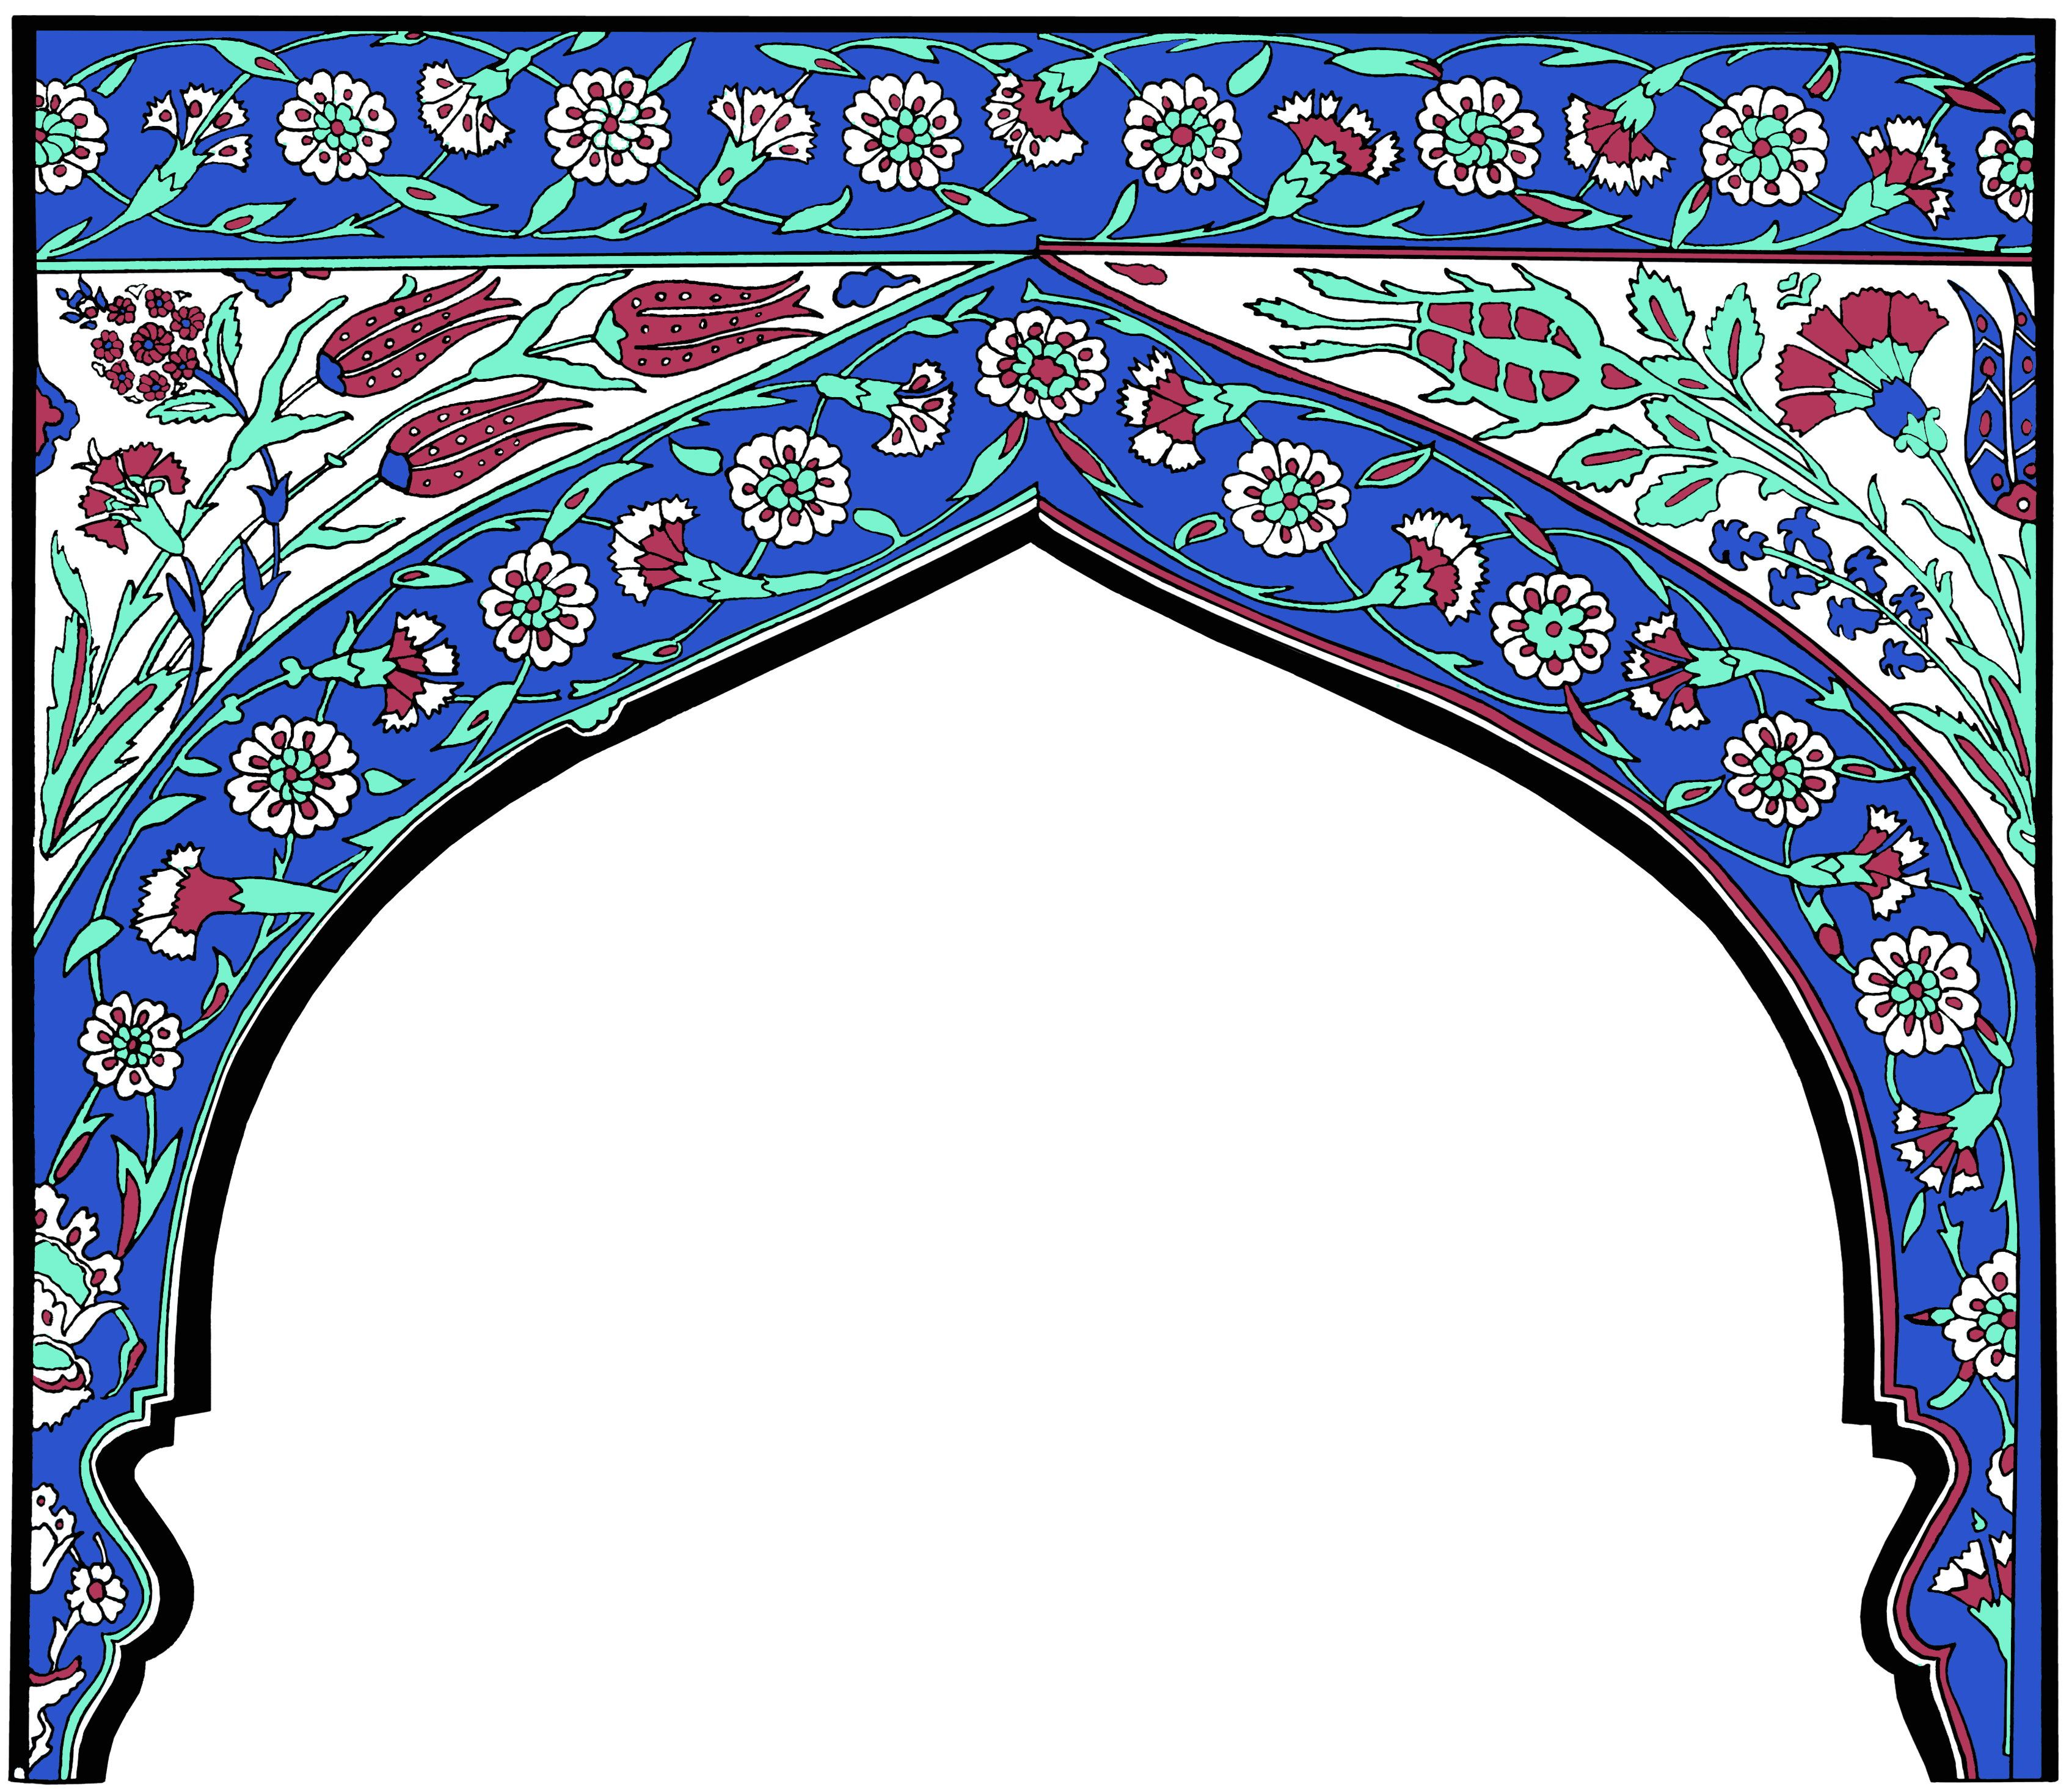 Turkish Design گالری - آلبوم: هنر ترکی - تصویر: turkish design_5 | arabes